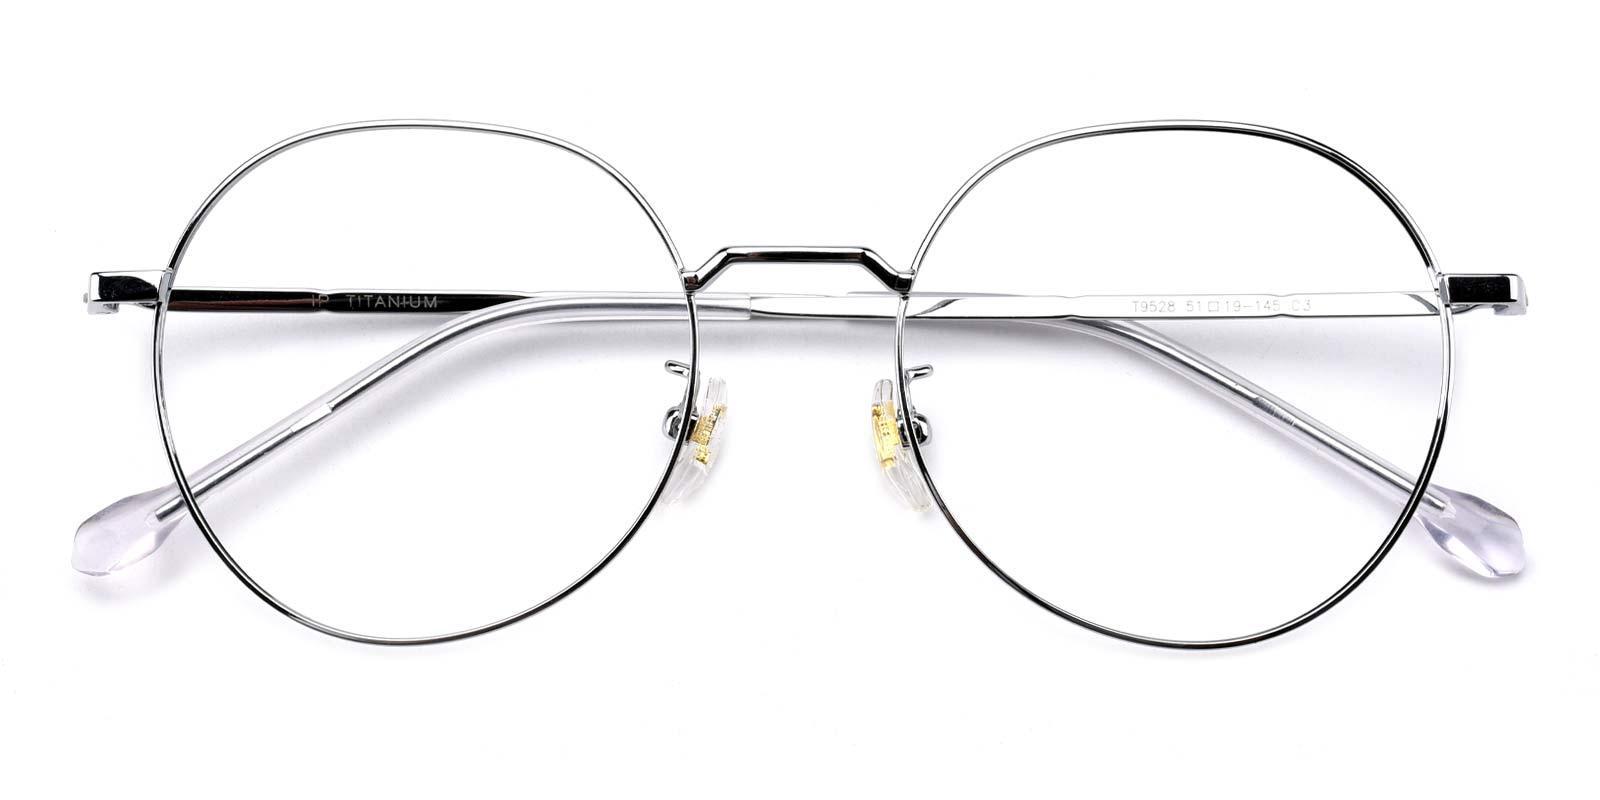 Berkeley-Silver-Round-Titanium-Eyeglasses-detail